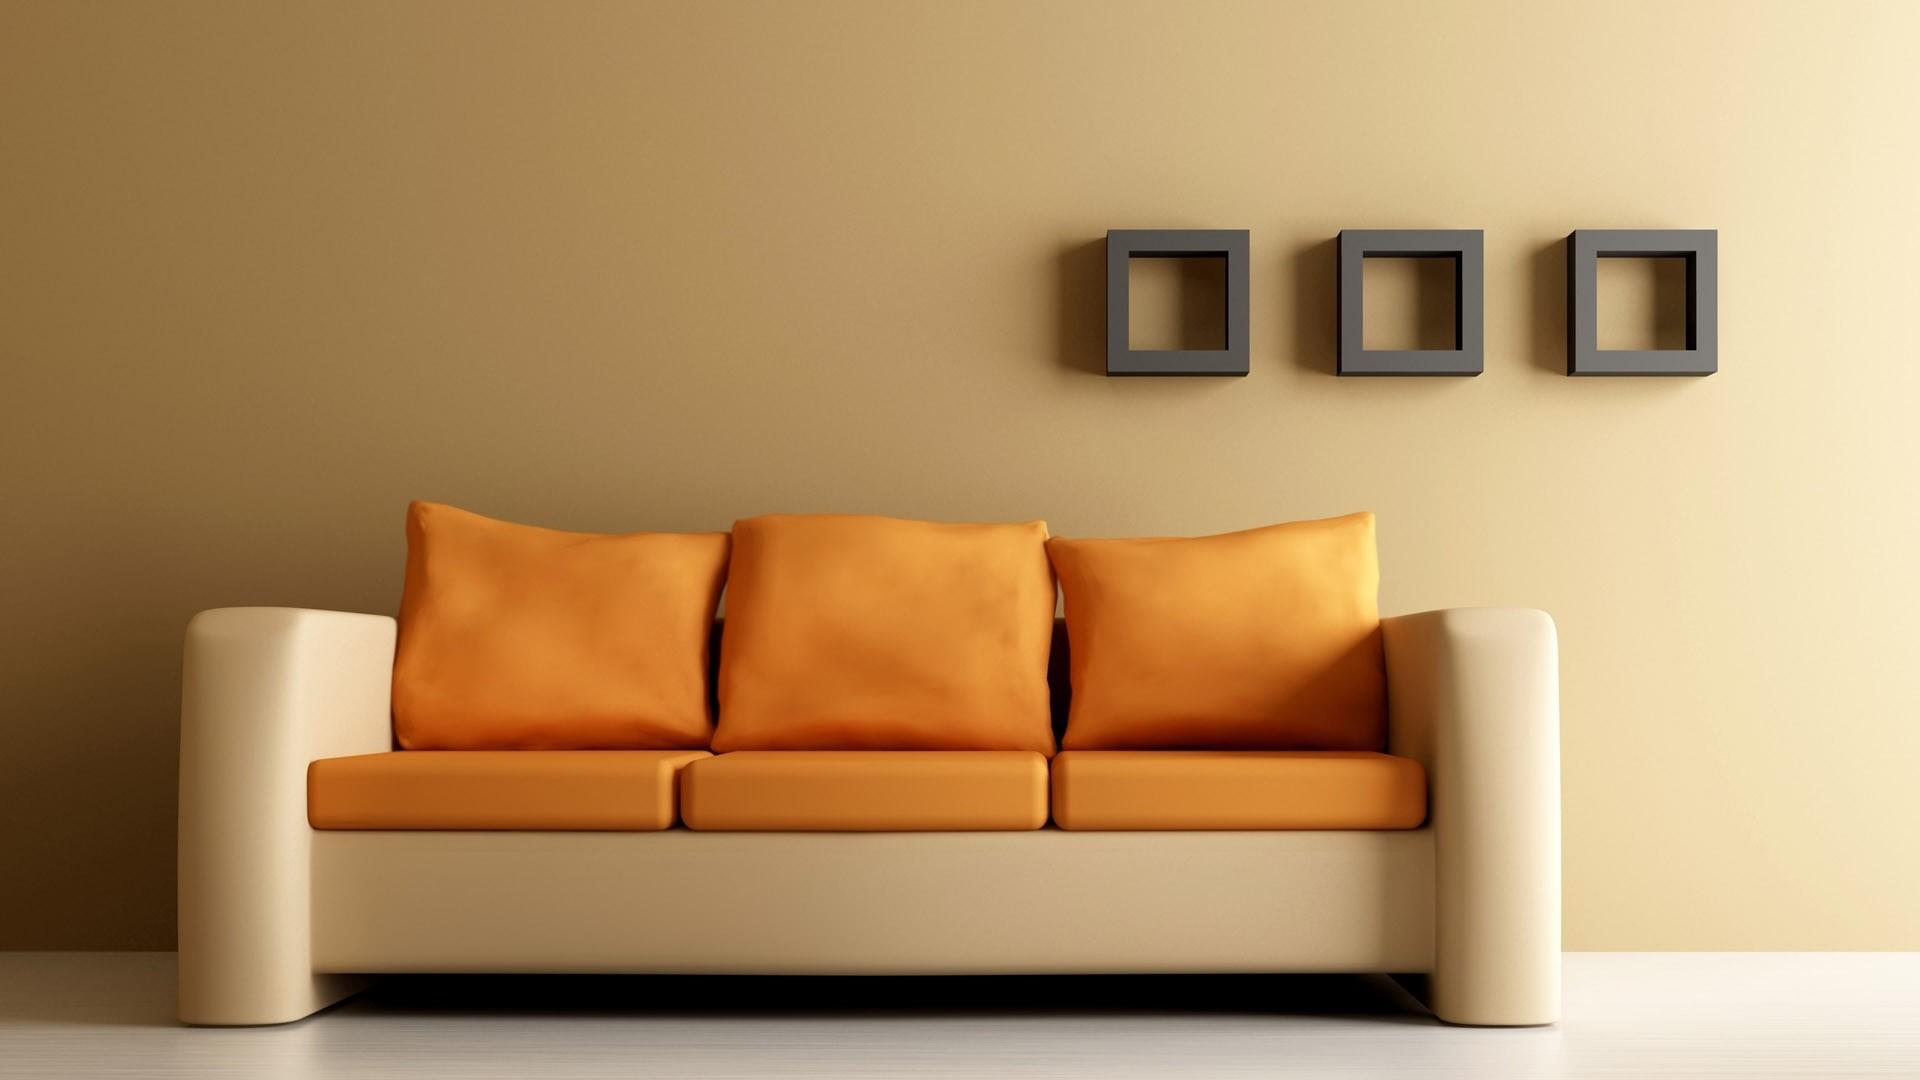 Preview wallpaper sofa, shelves, walls, design 1920×1080